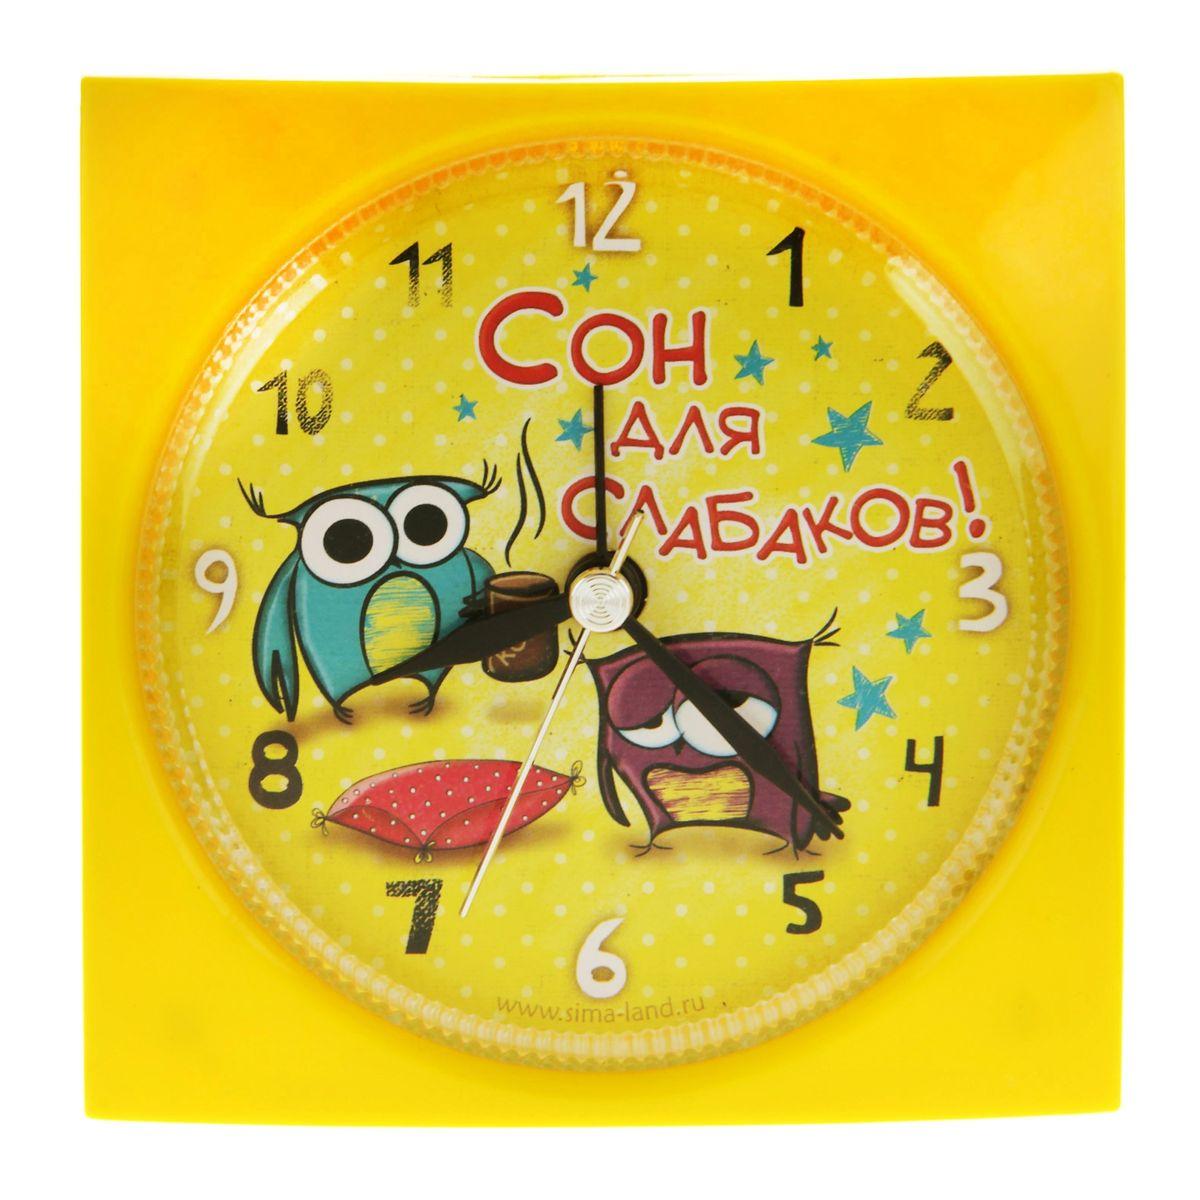 Часы-будильник квадрат Сон для слабаков, 9 см 845896845896Пластик